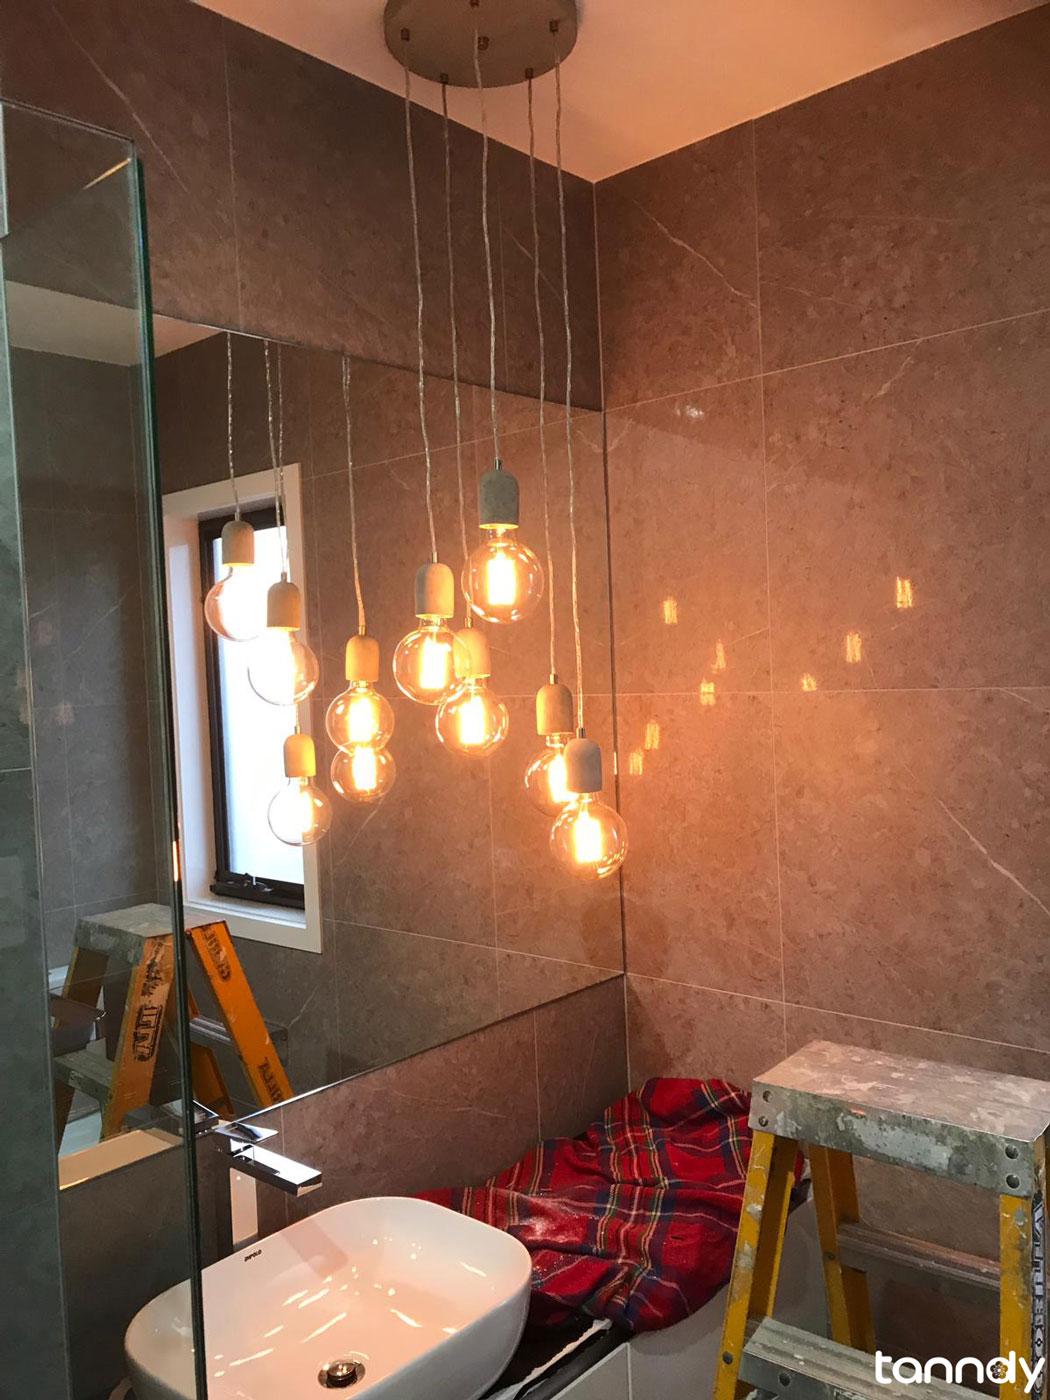 lighting in the bathroom